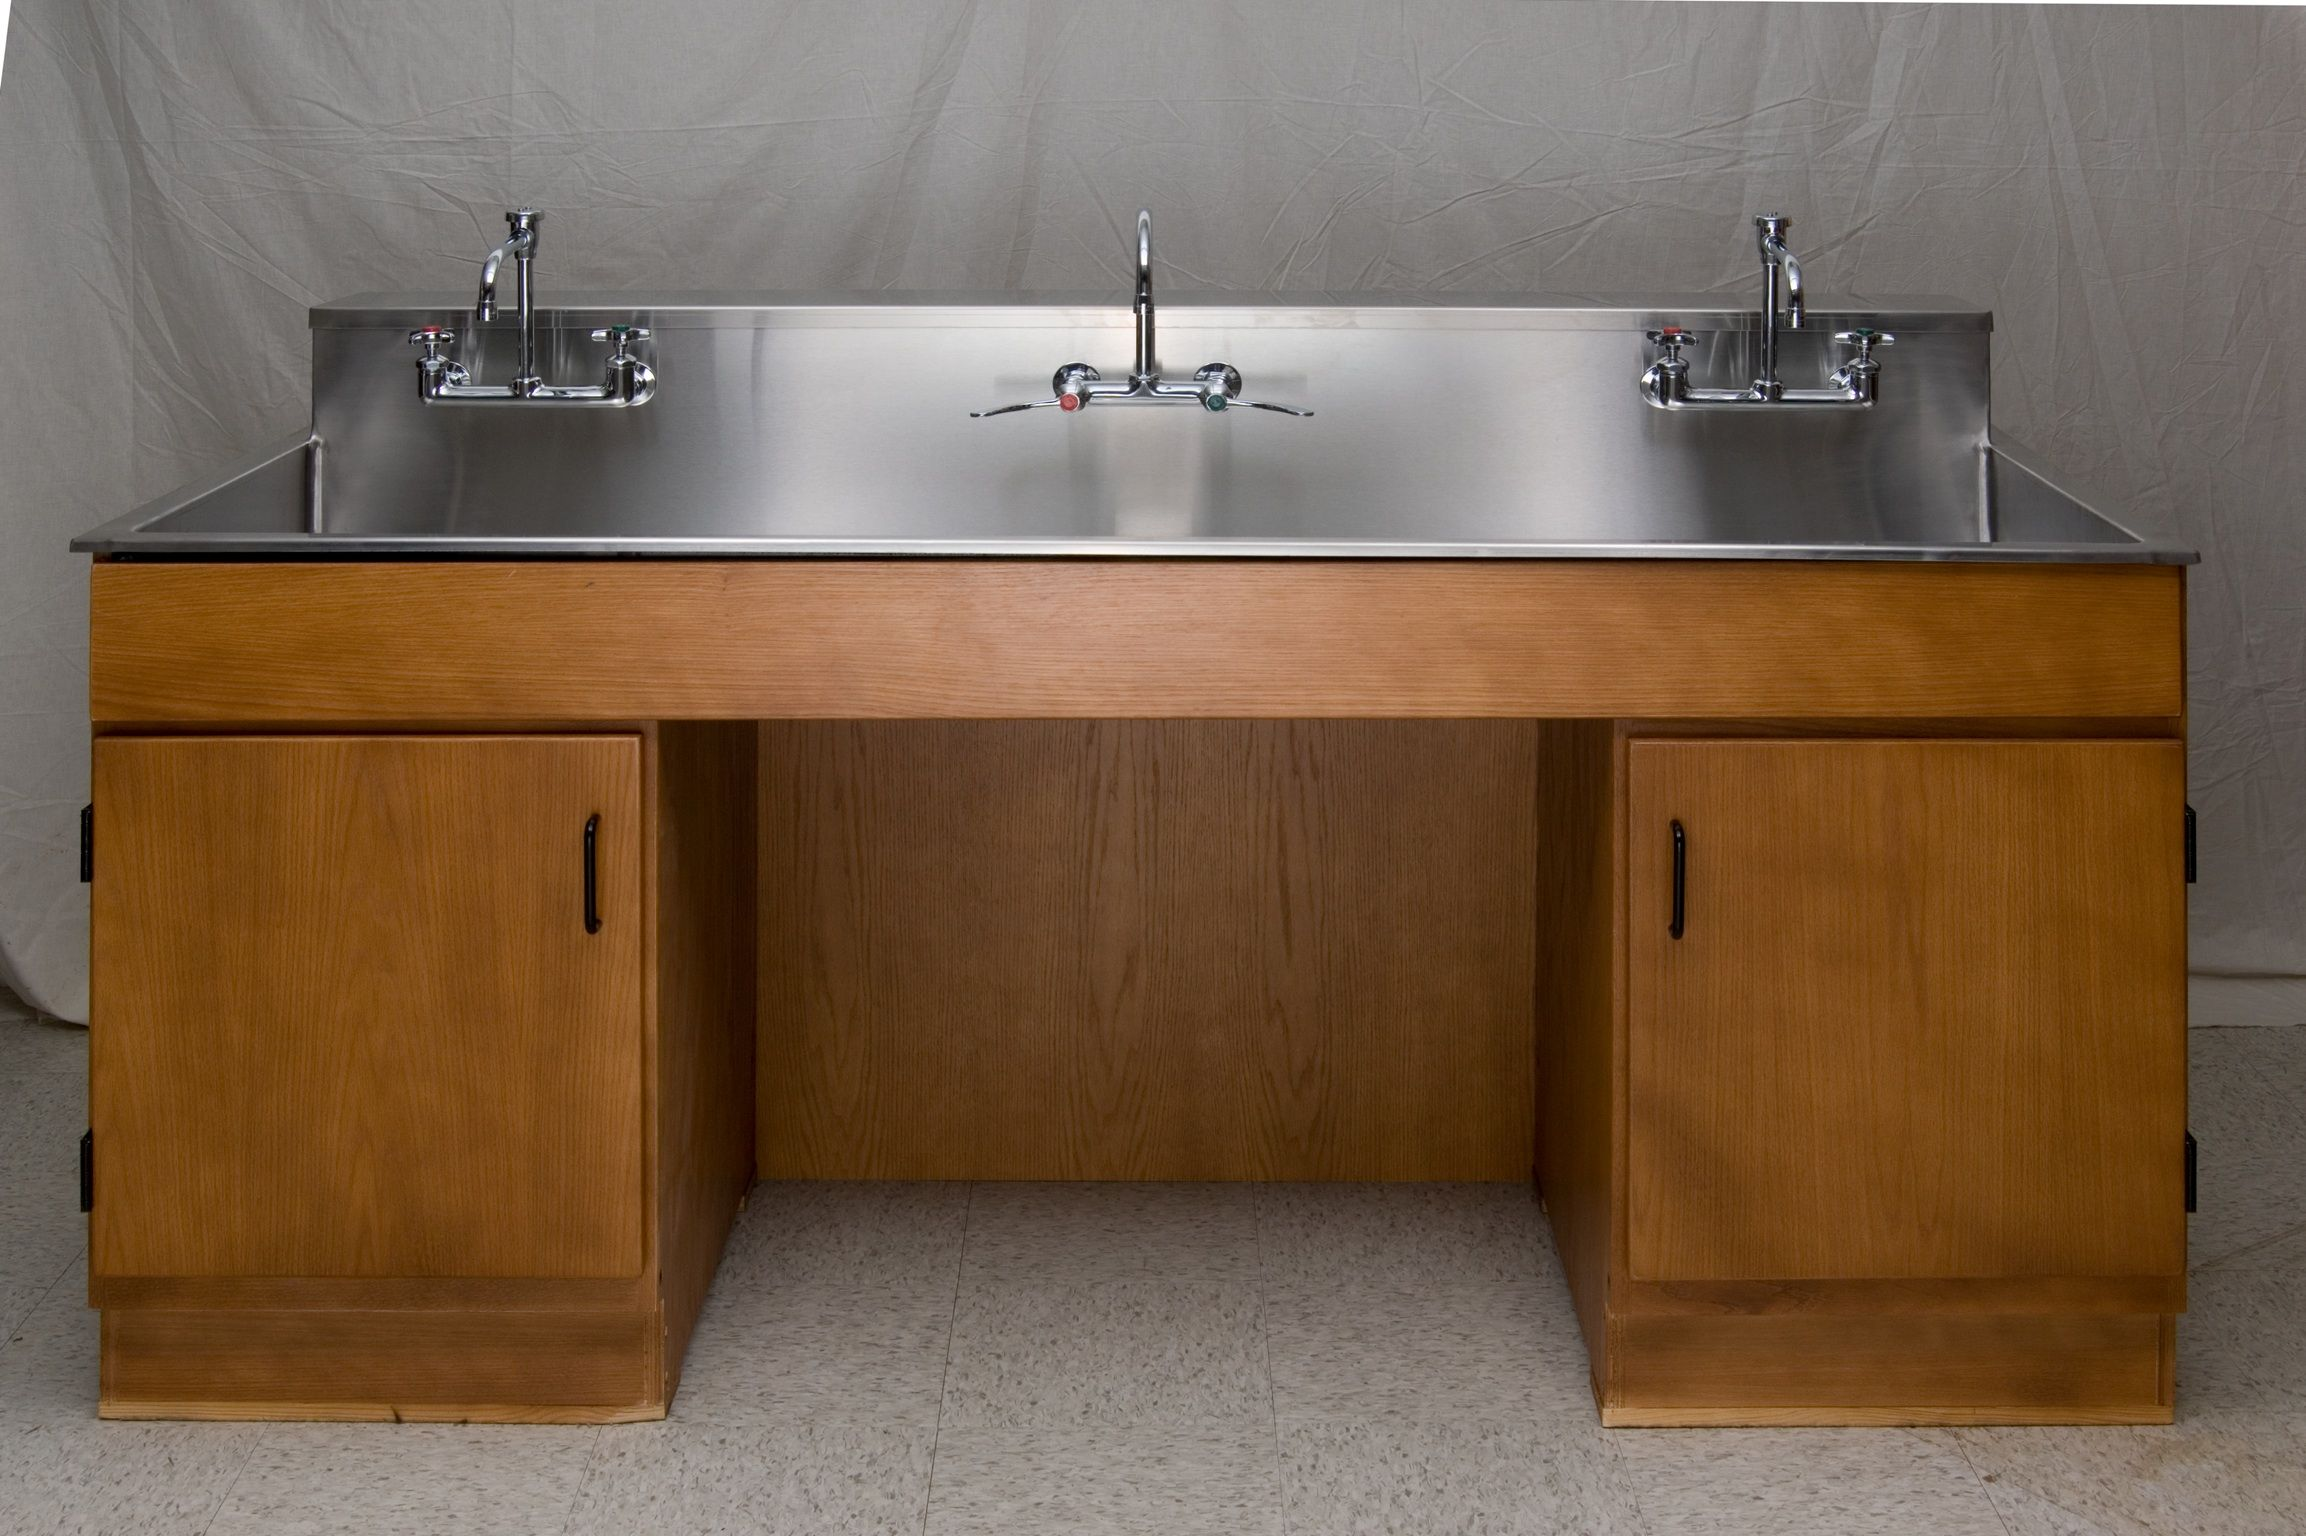 Art Sink The Sheldon Art Stainless Steel Sink Assembly Is